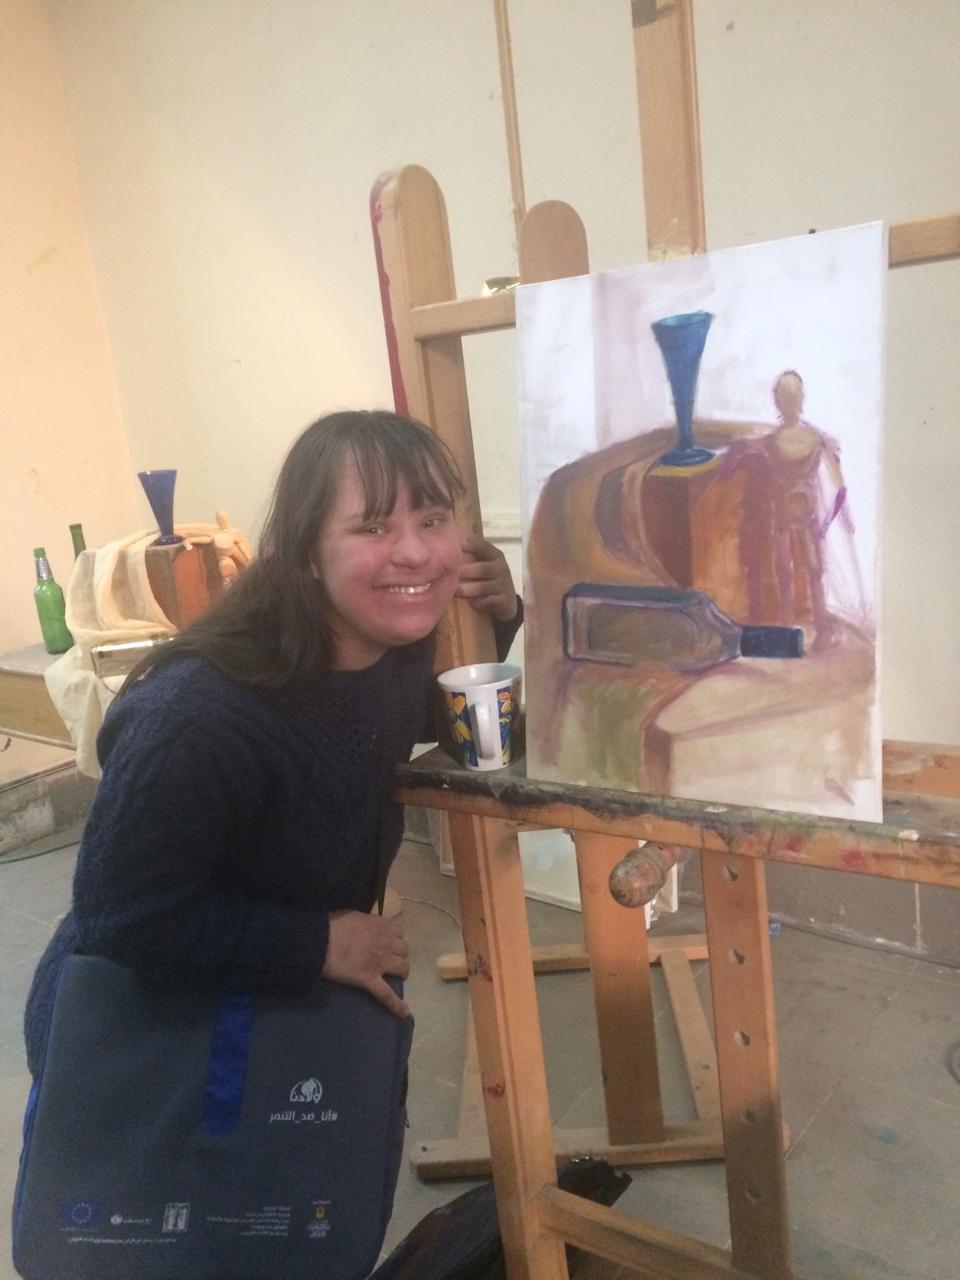 كارين مع احدى لوحاتها